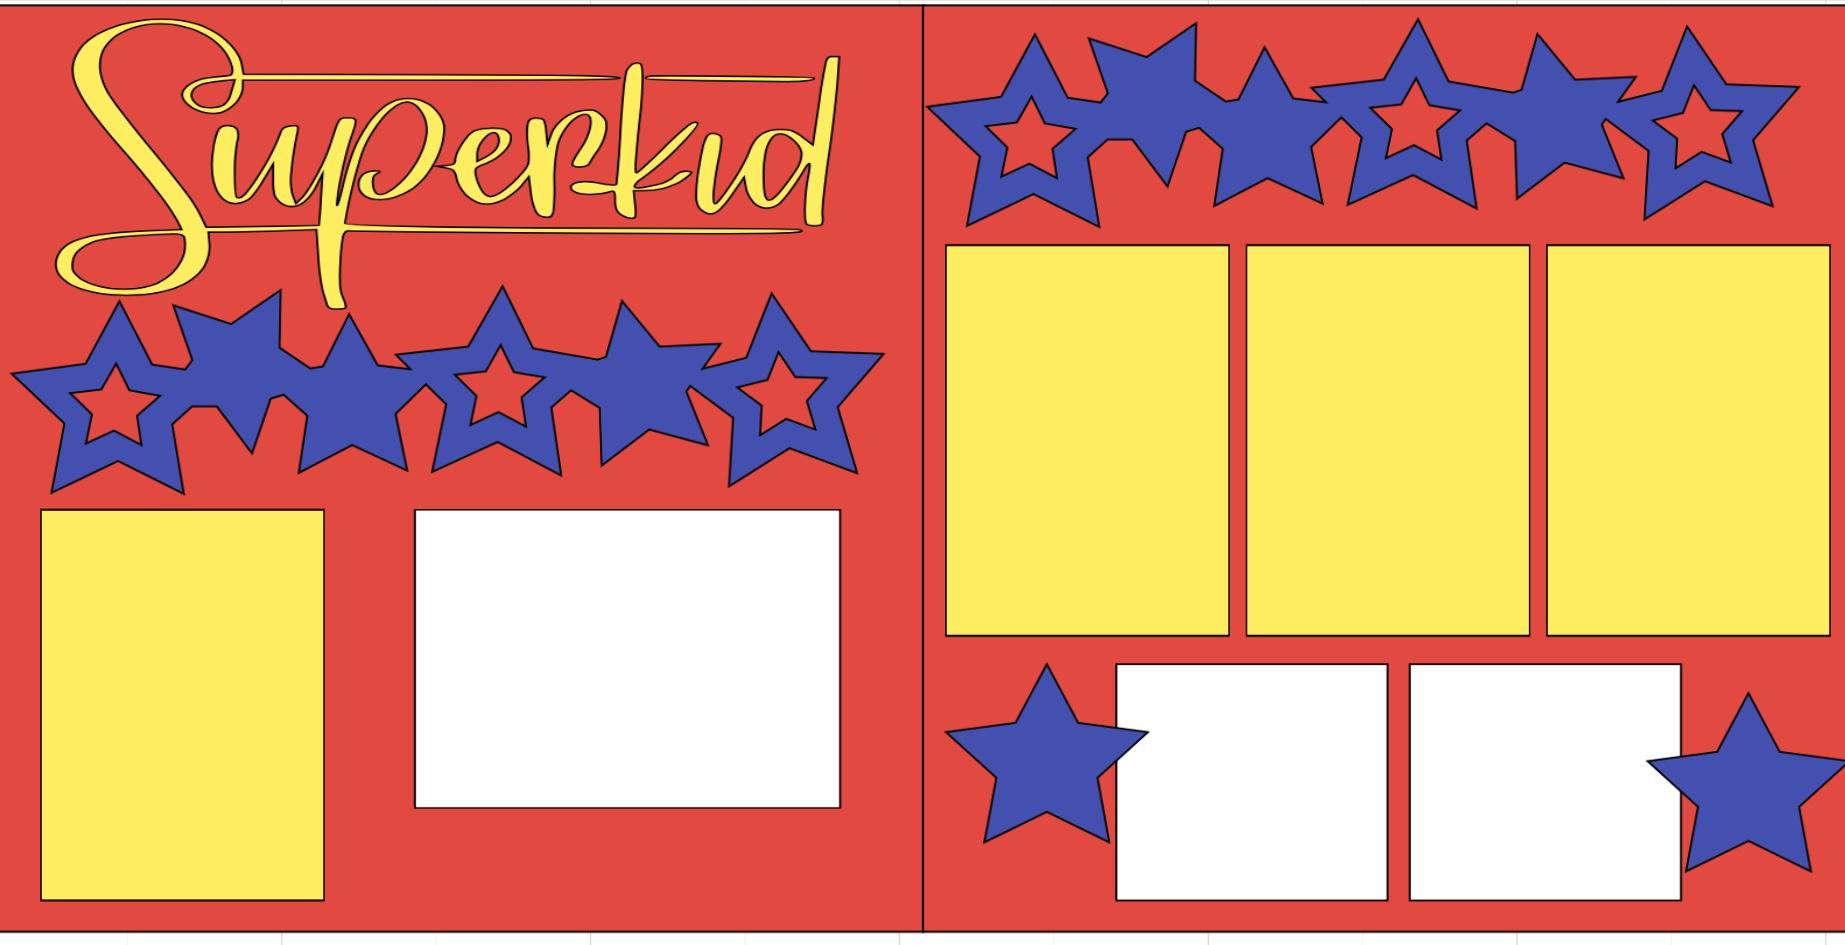 Superkid-  page kit